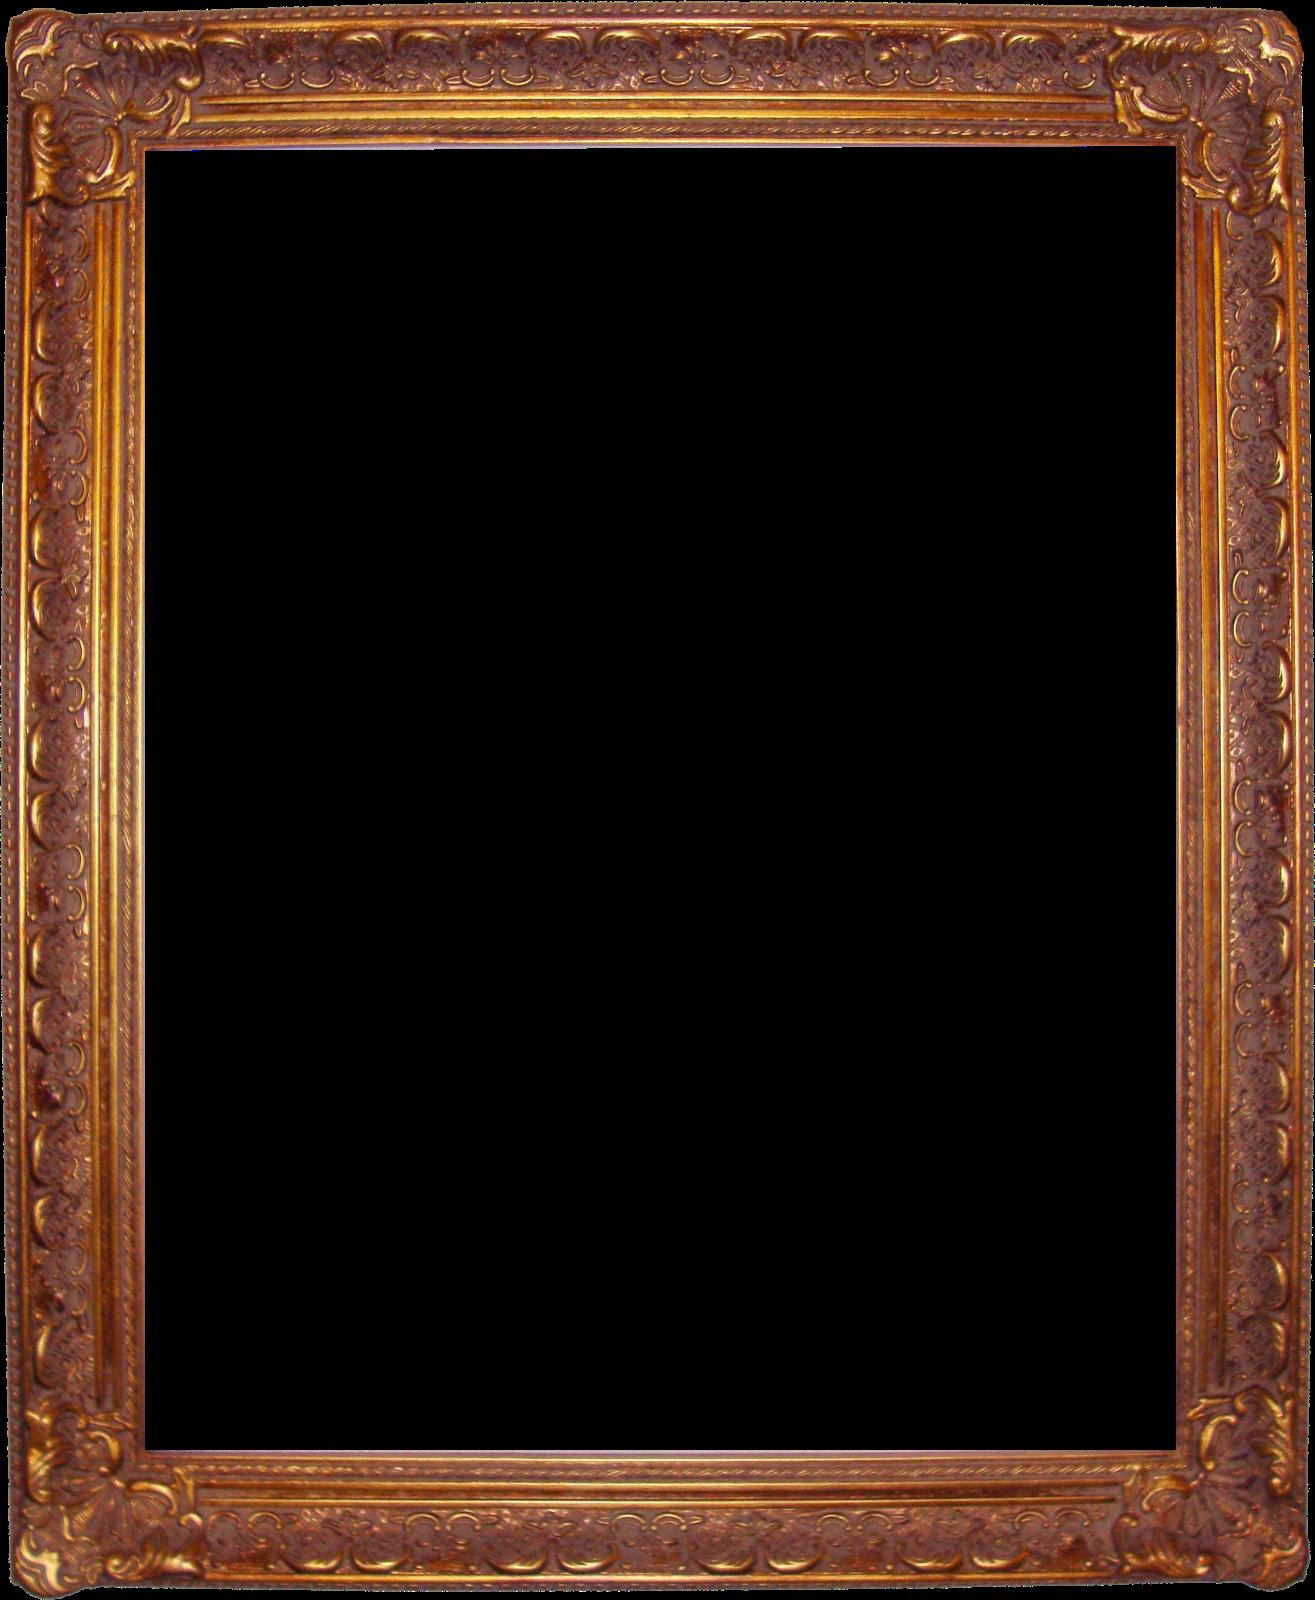 Frames clipart wood. Wooden frame gallery google